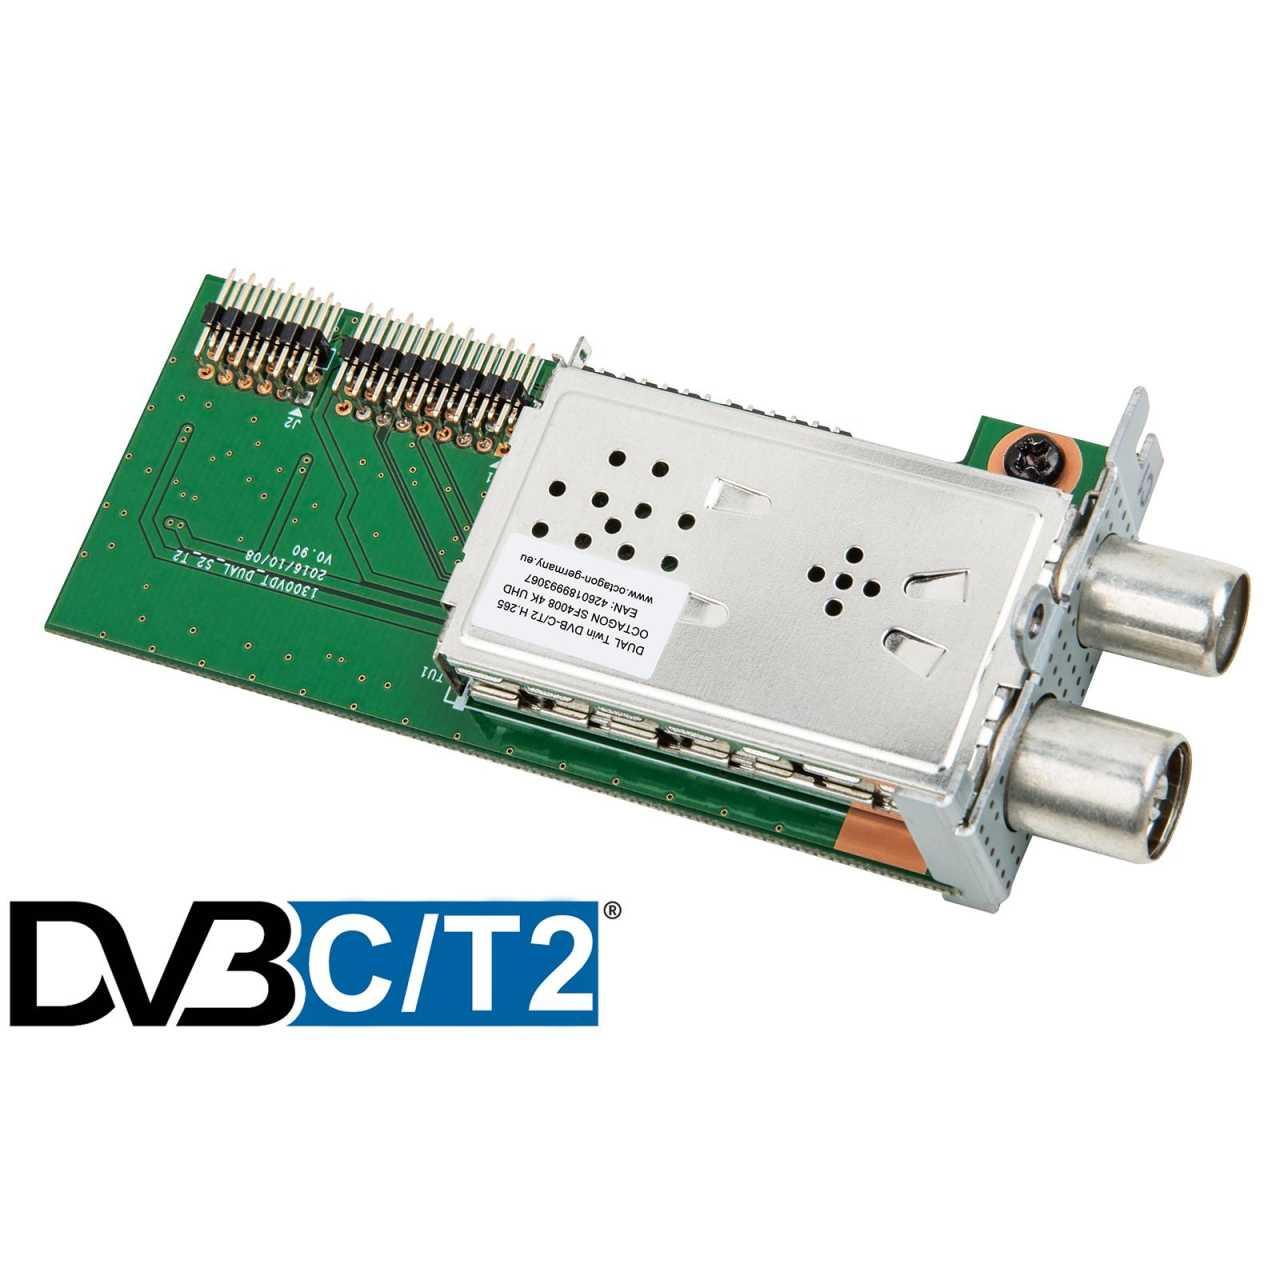 Octagon DUAL Twin DVB-C/T2 HD Tuner für SF4008 4K UHD OCTZUB024